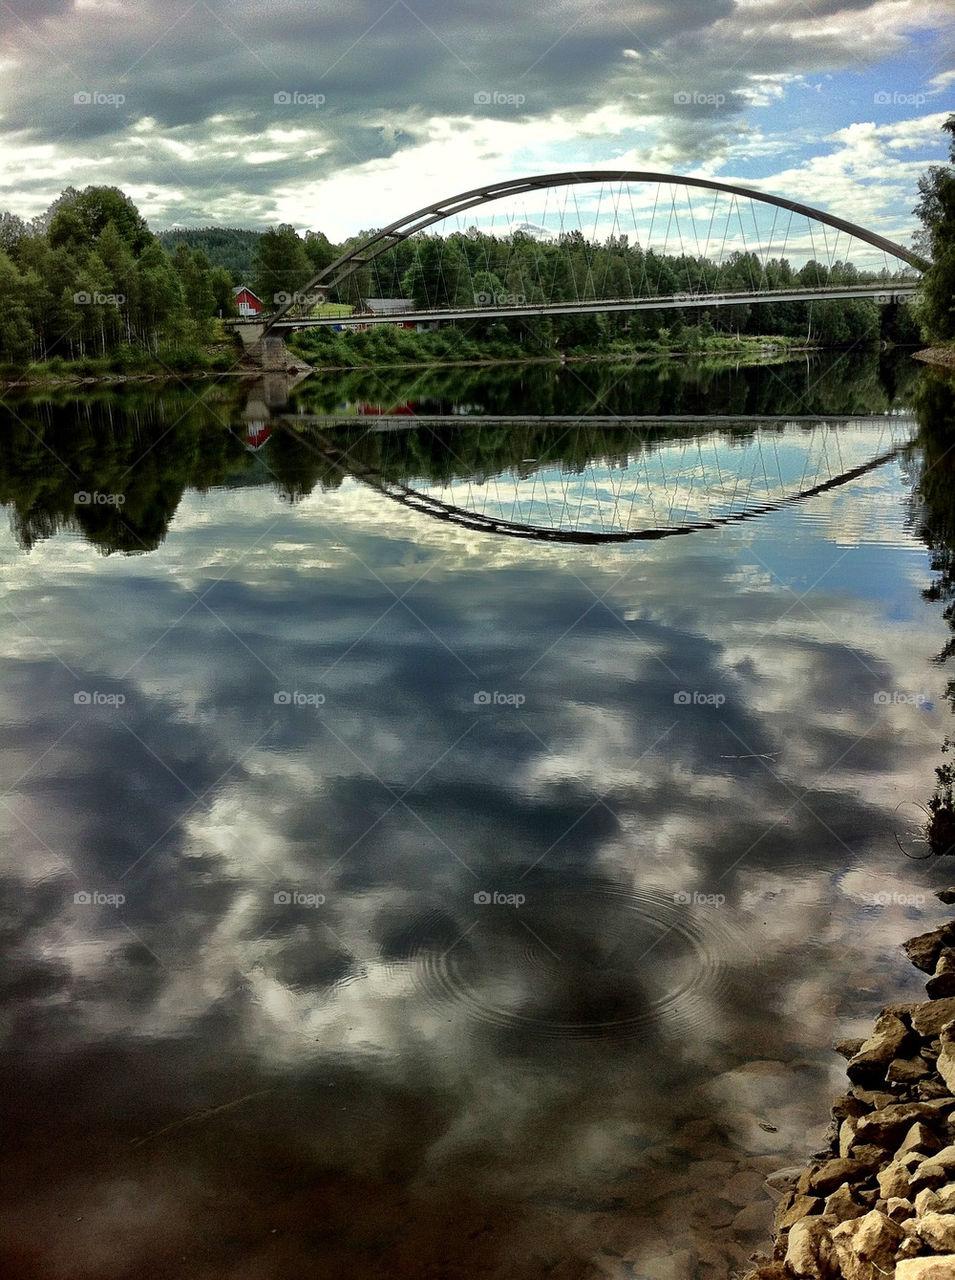 sommar river moln bridge by ka71